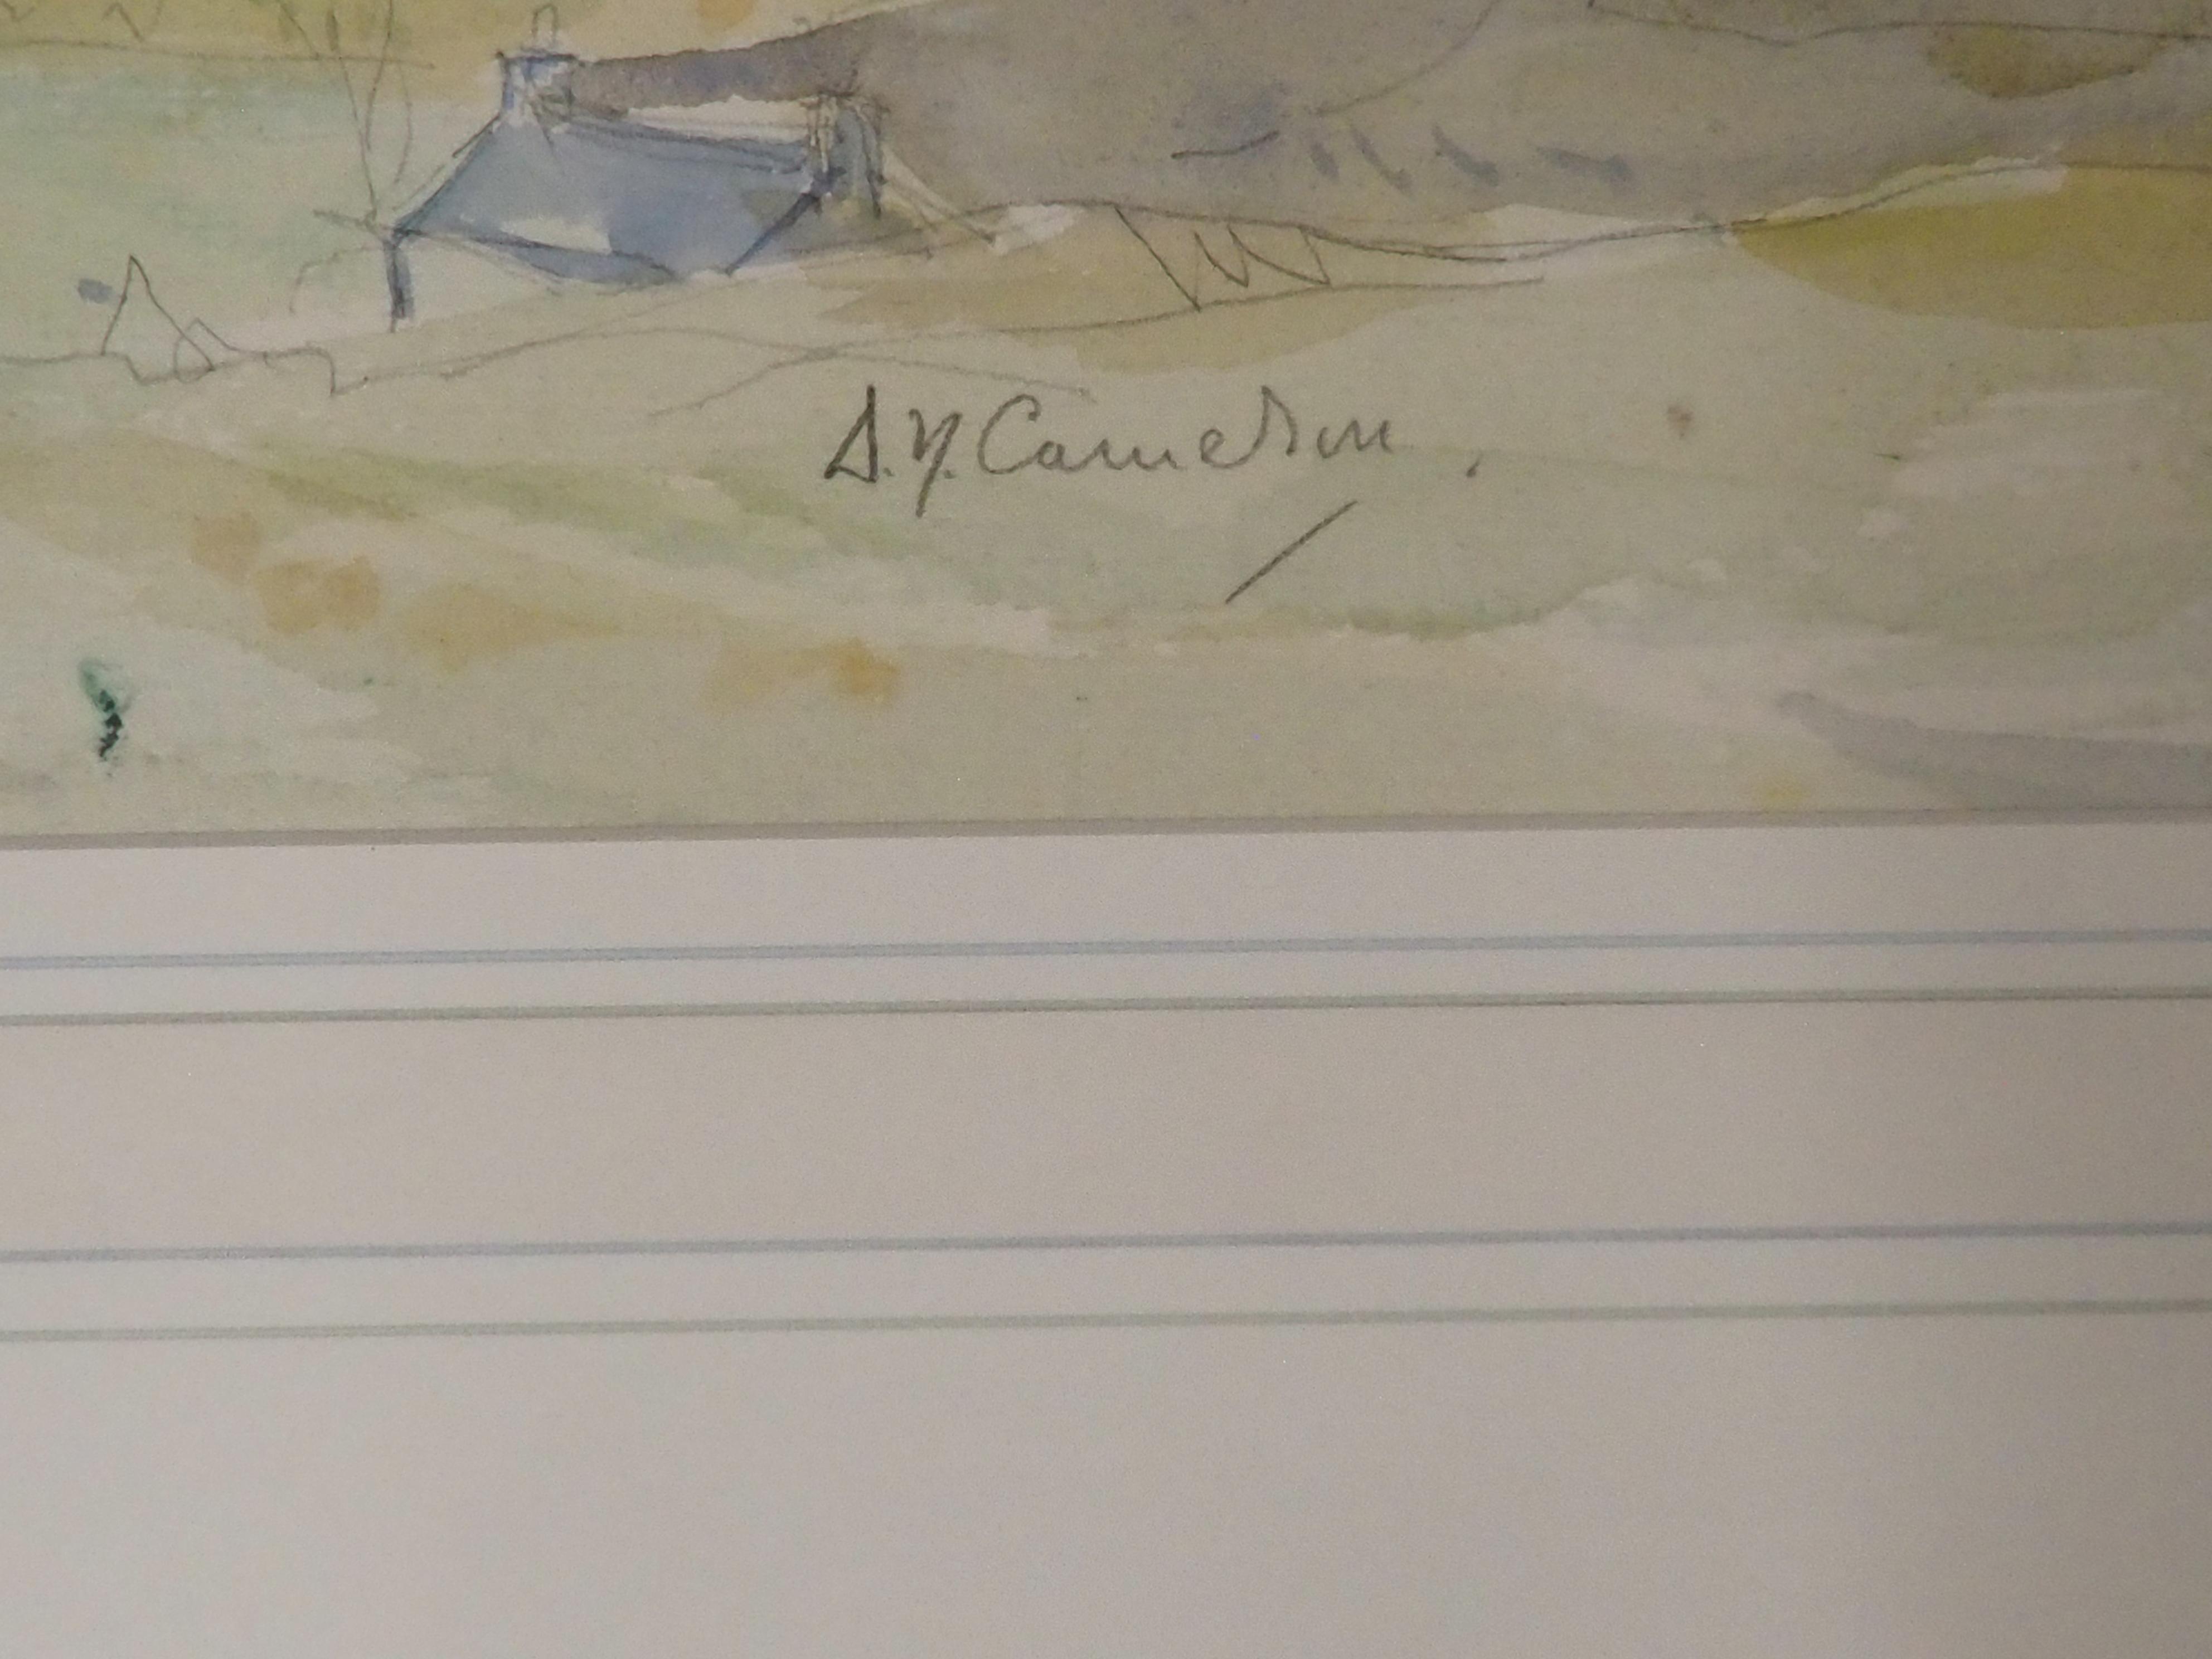 SIR DAVID YOUNG CAMERON RA, RSA, RWS, RSW, RE (SCOTTISH 1865-1945) THE LAKE OF MENTEITH AND - Image 3 of 5